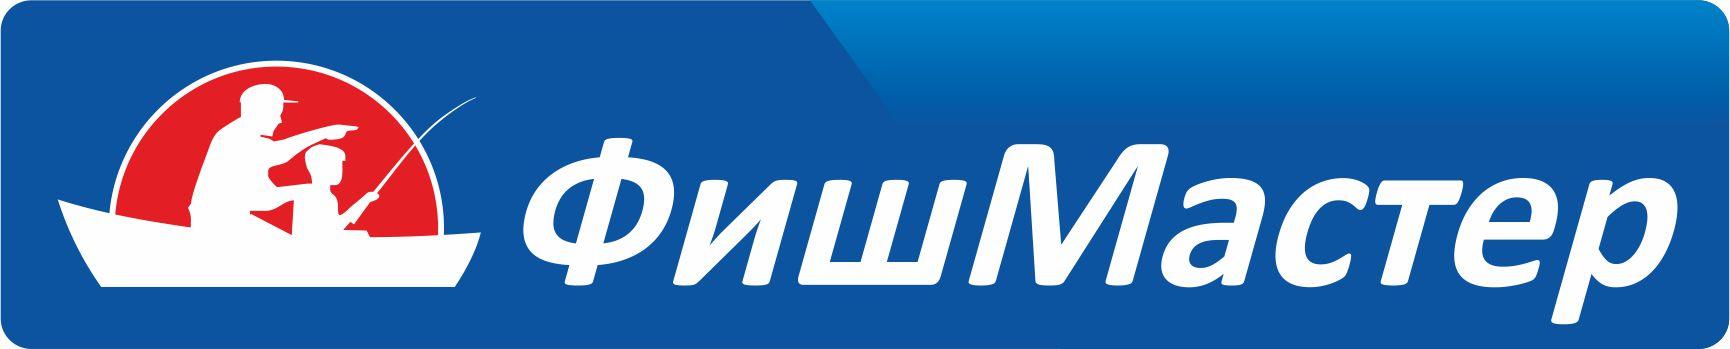 Логотип bl.jpg